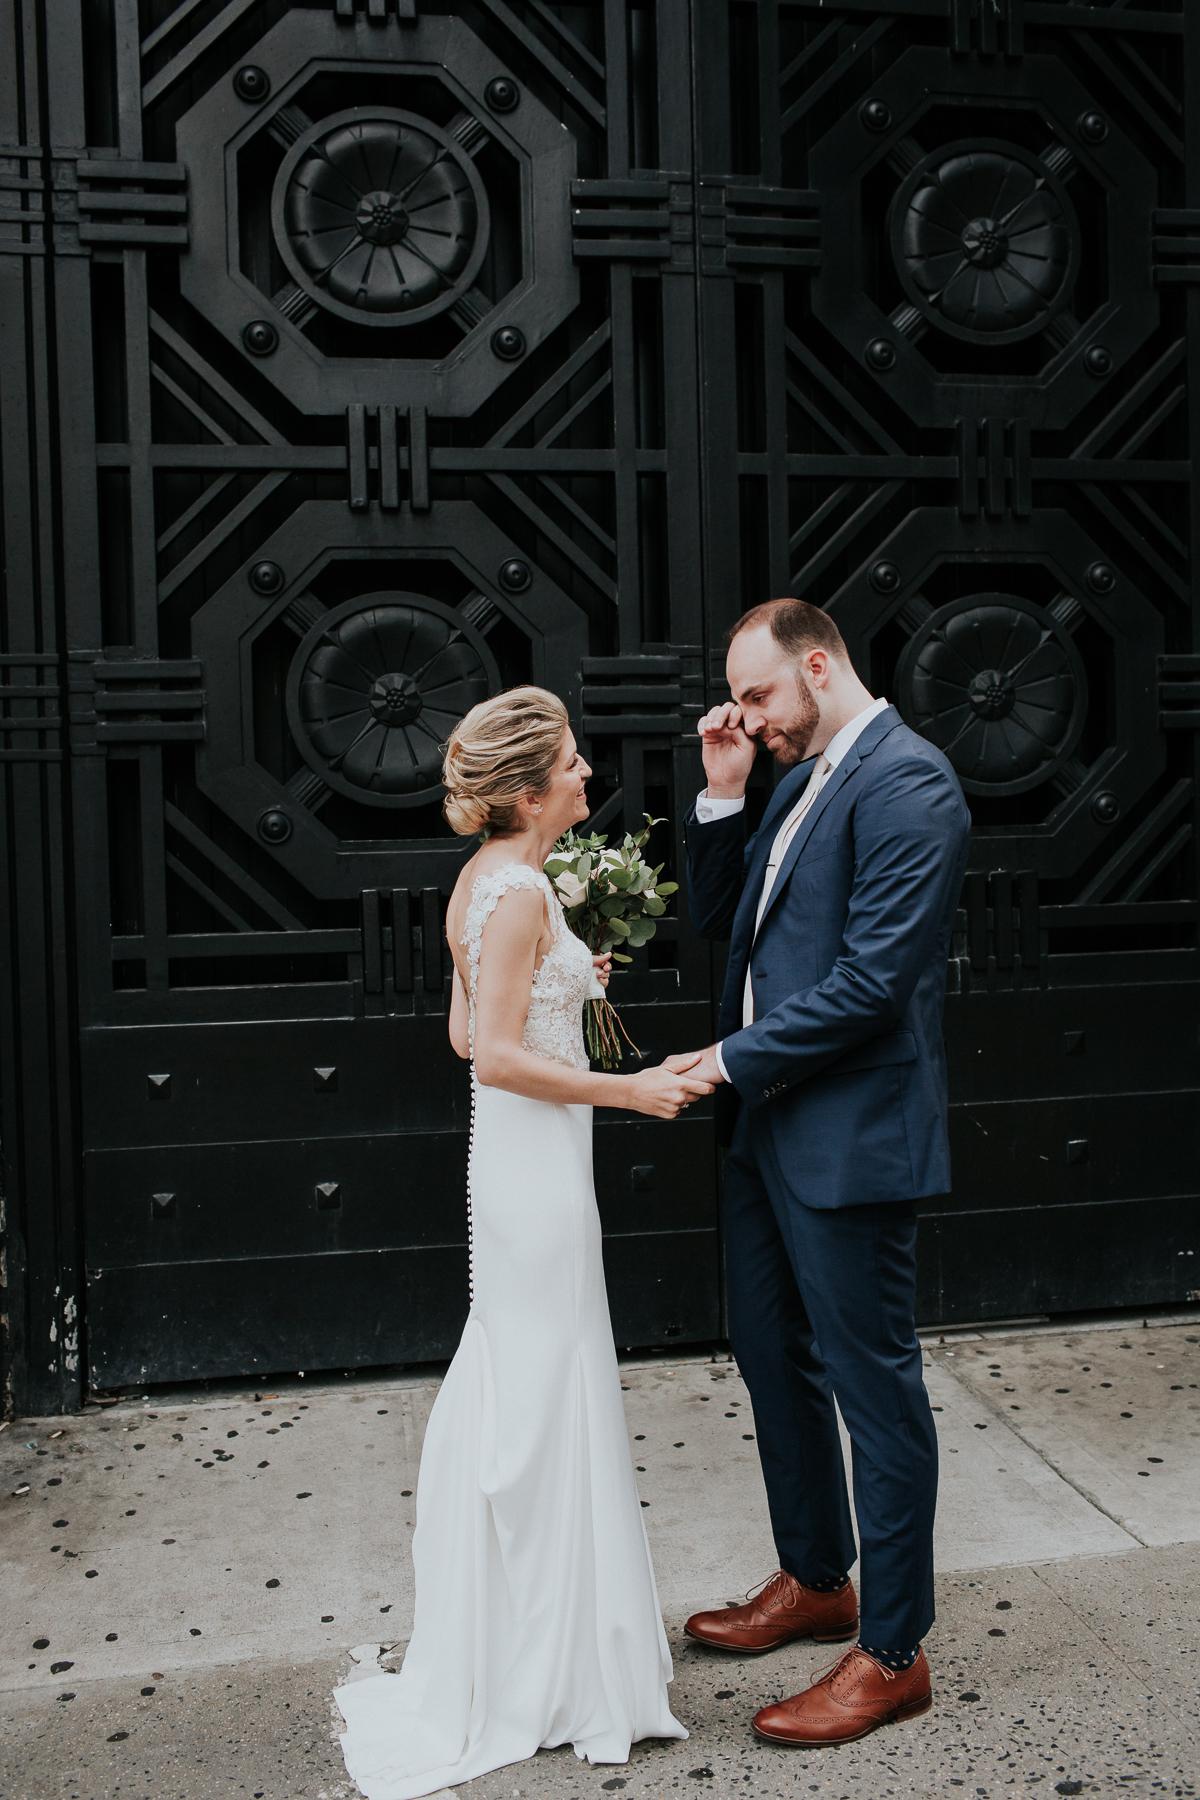 Frankies-457-Spuntino-Intimate-Brooklyn-Restaurant-Wedding-Photographer-16.jpg